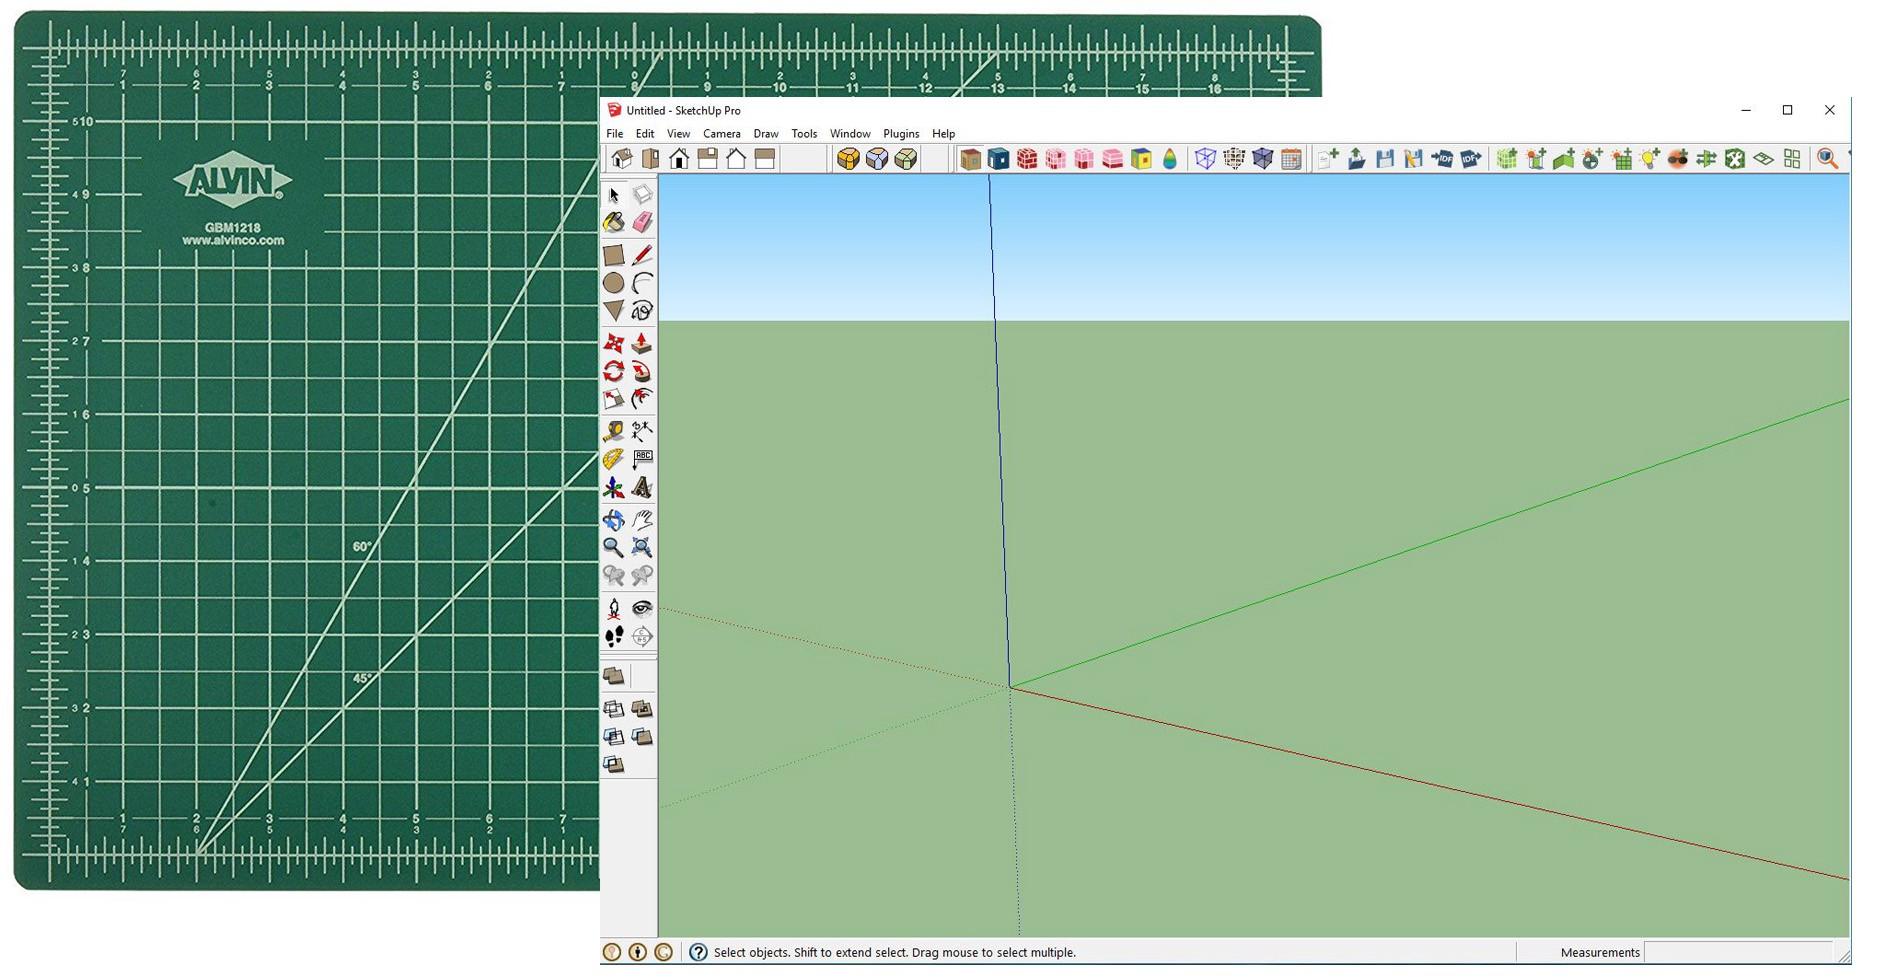 /sketch-modeling-with-hololens-b12e8e411b85 feature image